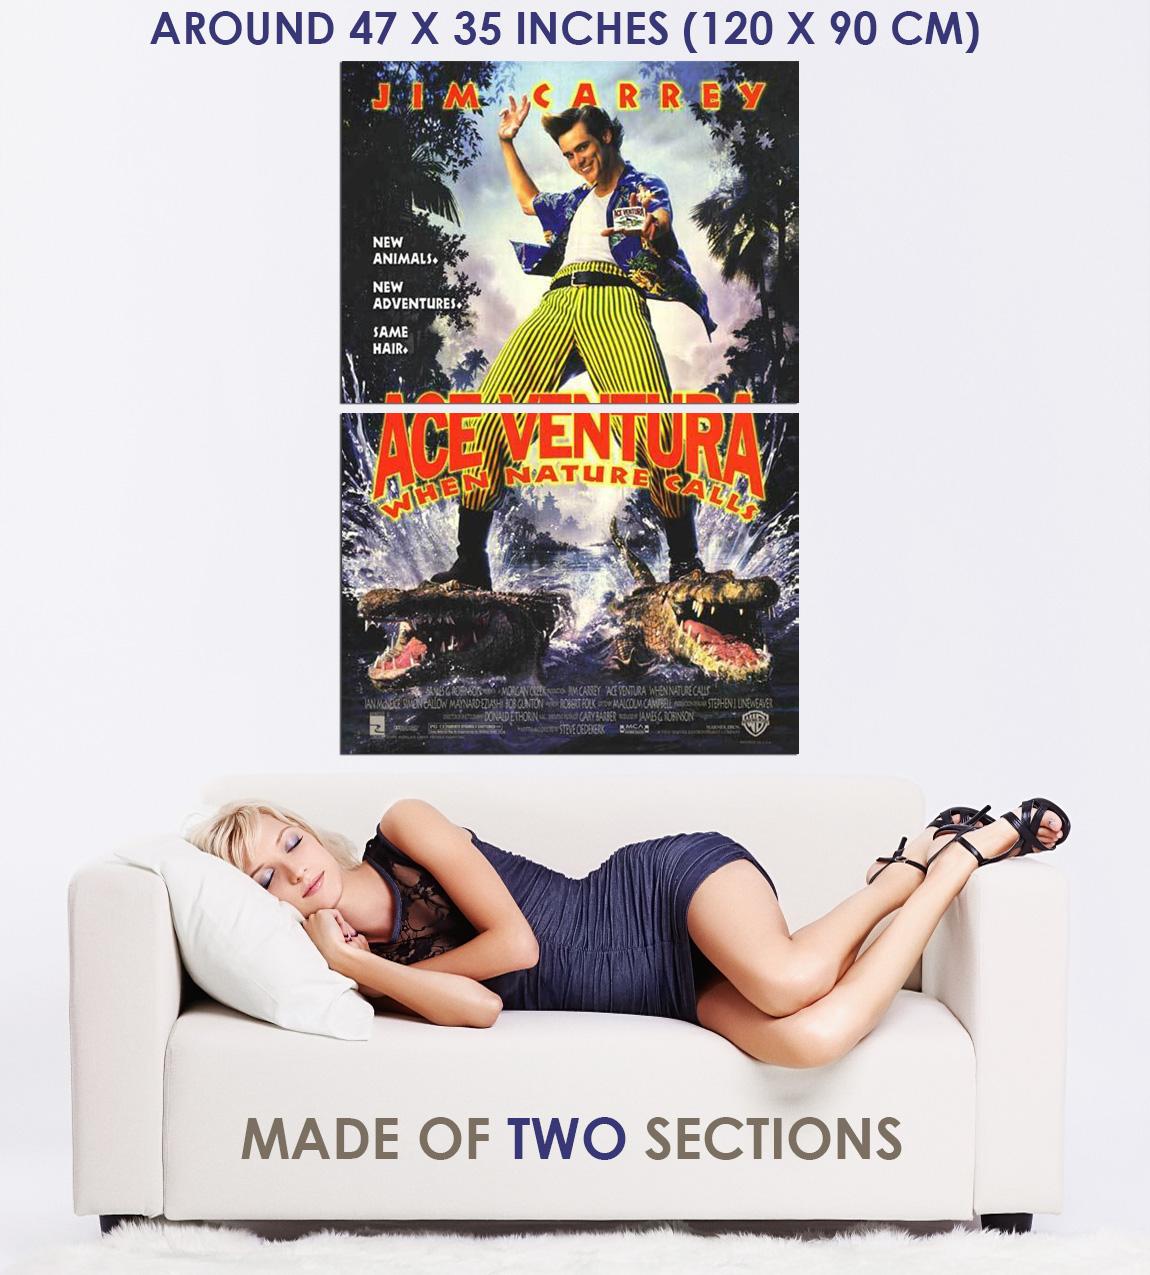 237420-ACE-VENTURA-WHEN-NATURE-CALLS-1995-Movie-WALL-PRINT-POSTER-US miniature 5